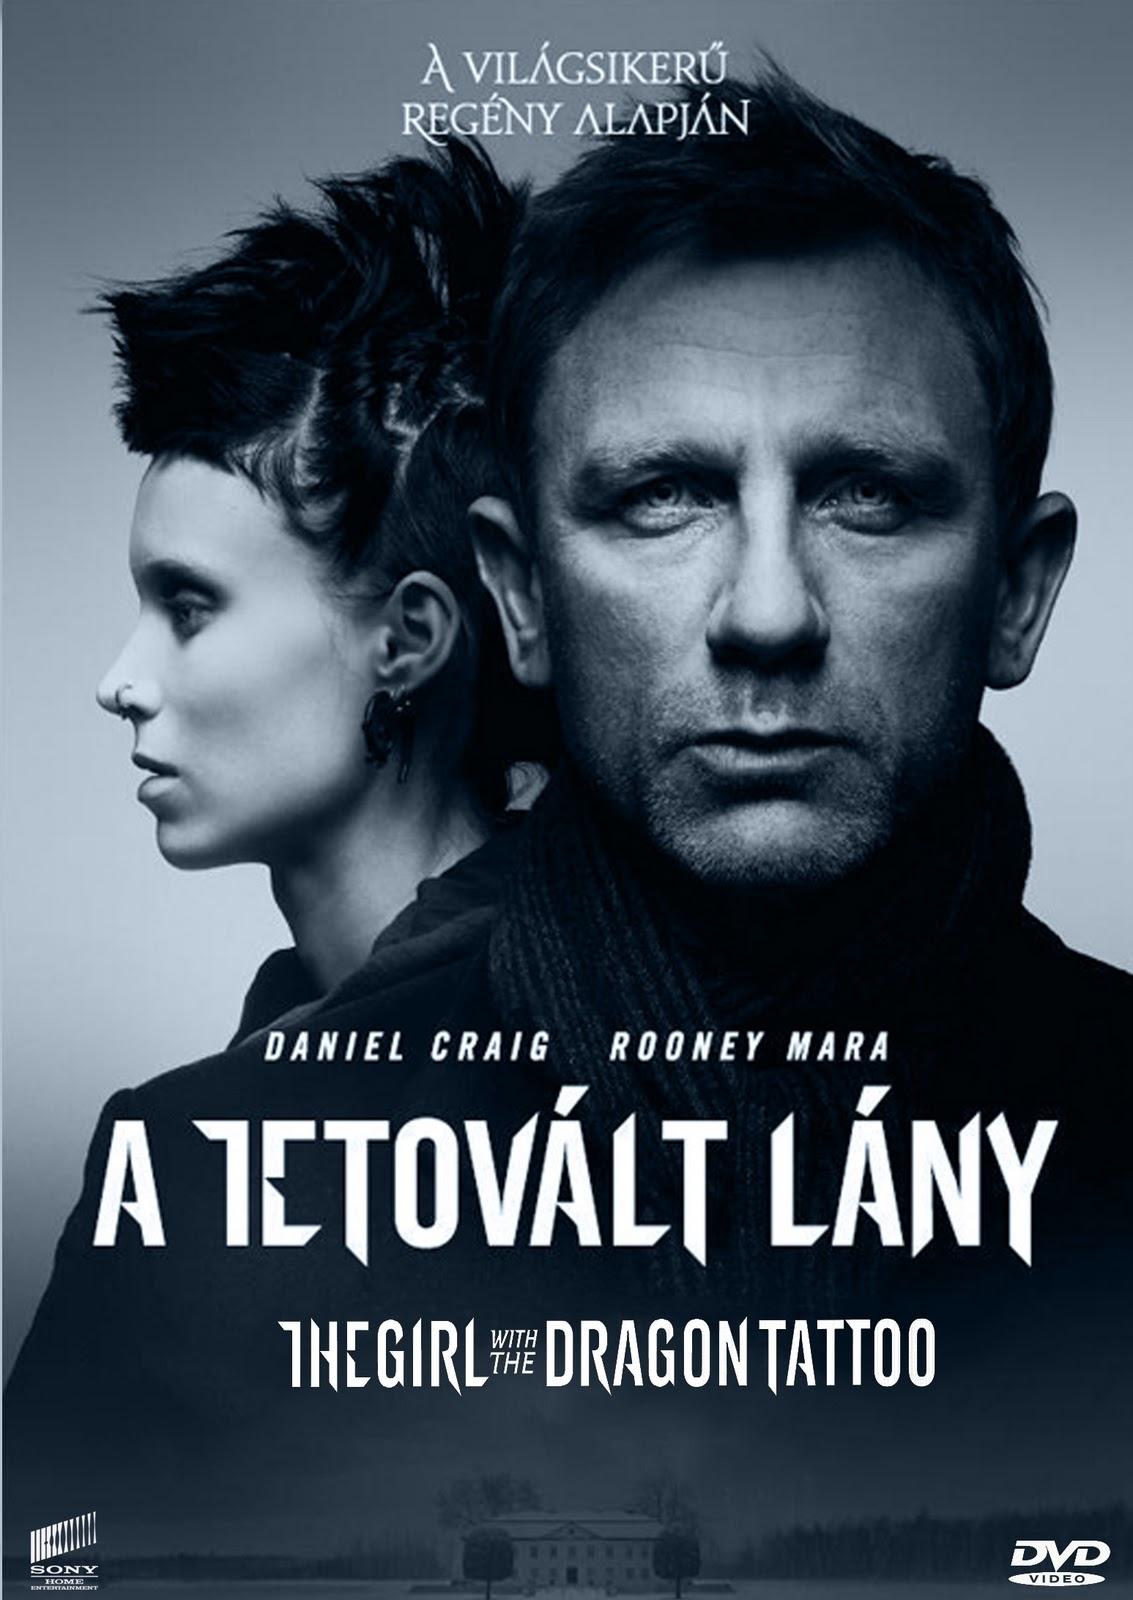 Tetov Lt L Ny The Girl With The Dragon Tattoo